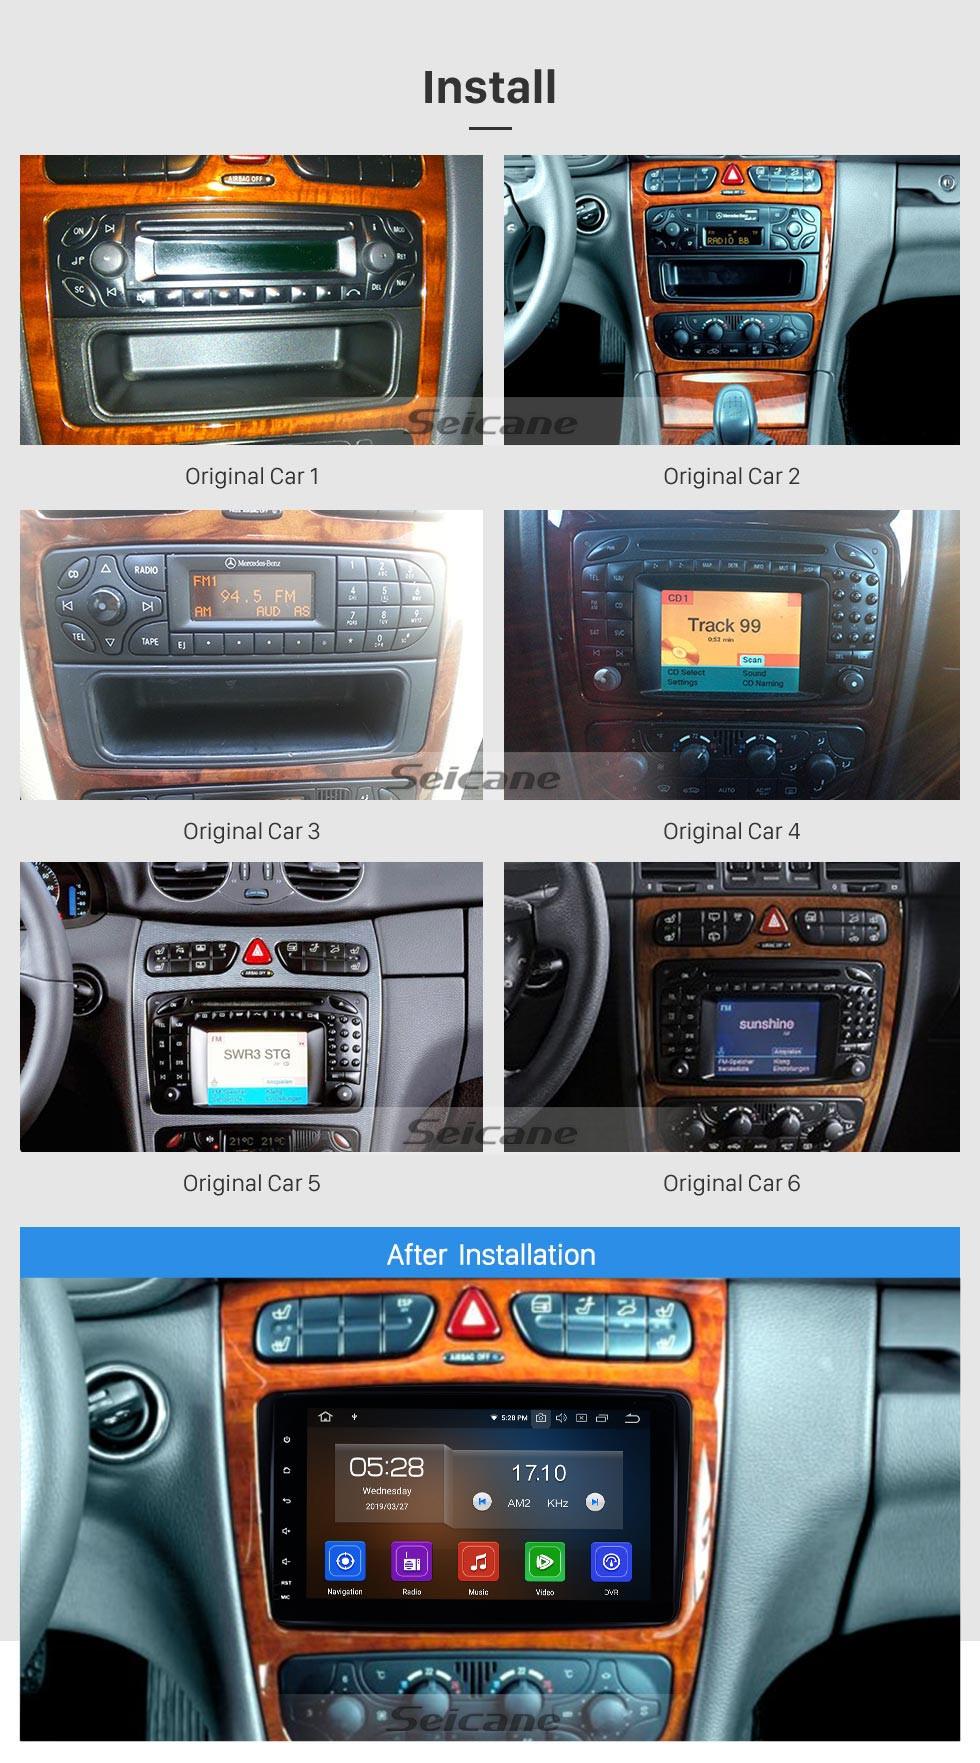 Seicane 8 inch 1024*600 HD Touch Screen 1998-2004 Mercedes-Benz CLK class W209 CLK200 CLK230 CLK320 CLK430 CLK55 Android 9.0 GPS Navigation Bluetooth Radio USB WIFI Stereo Support Digital TV DVR Rearview Camera 1080P Video Mirror Link